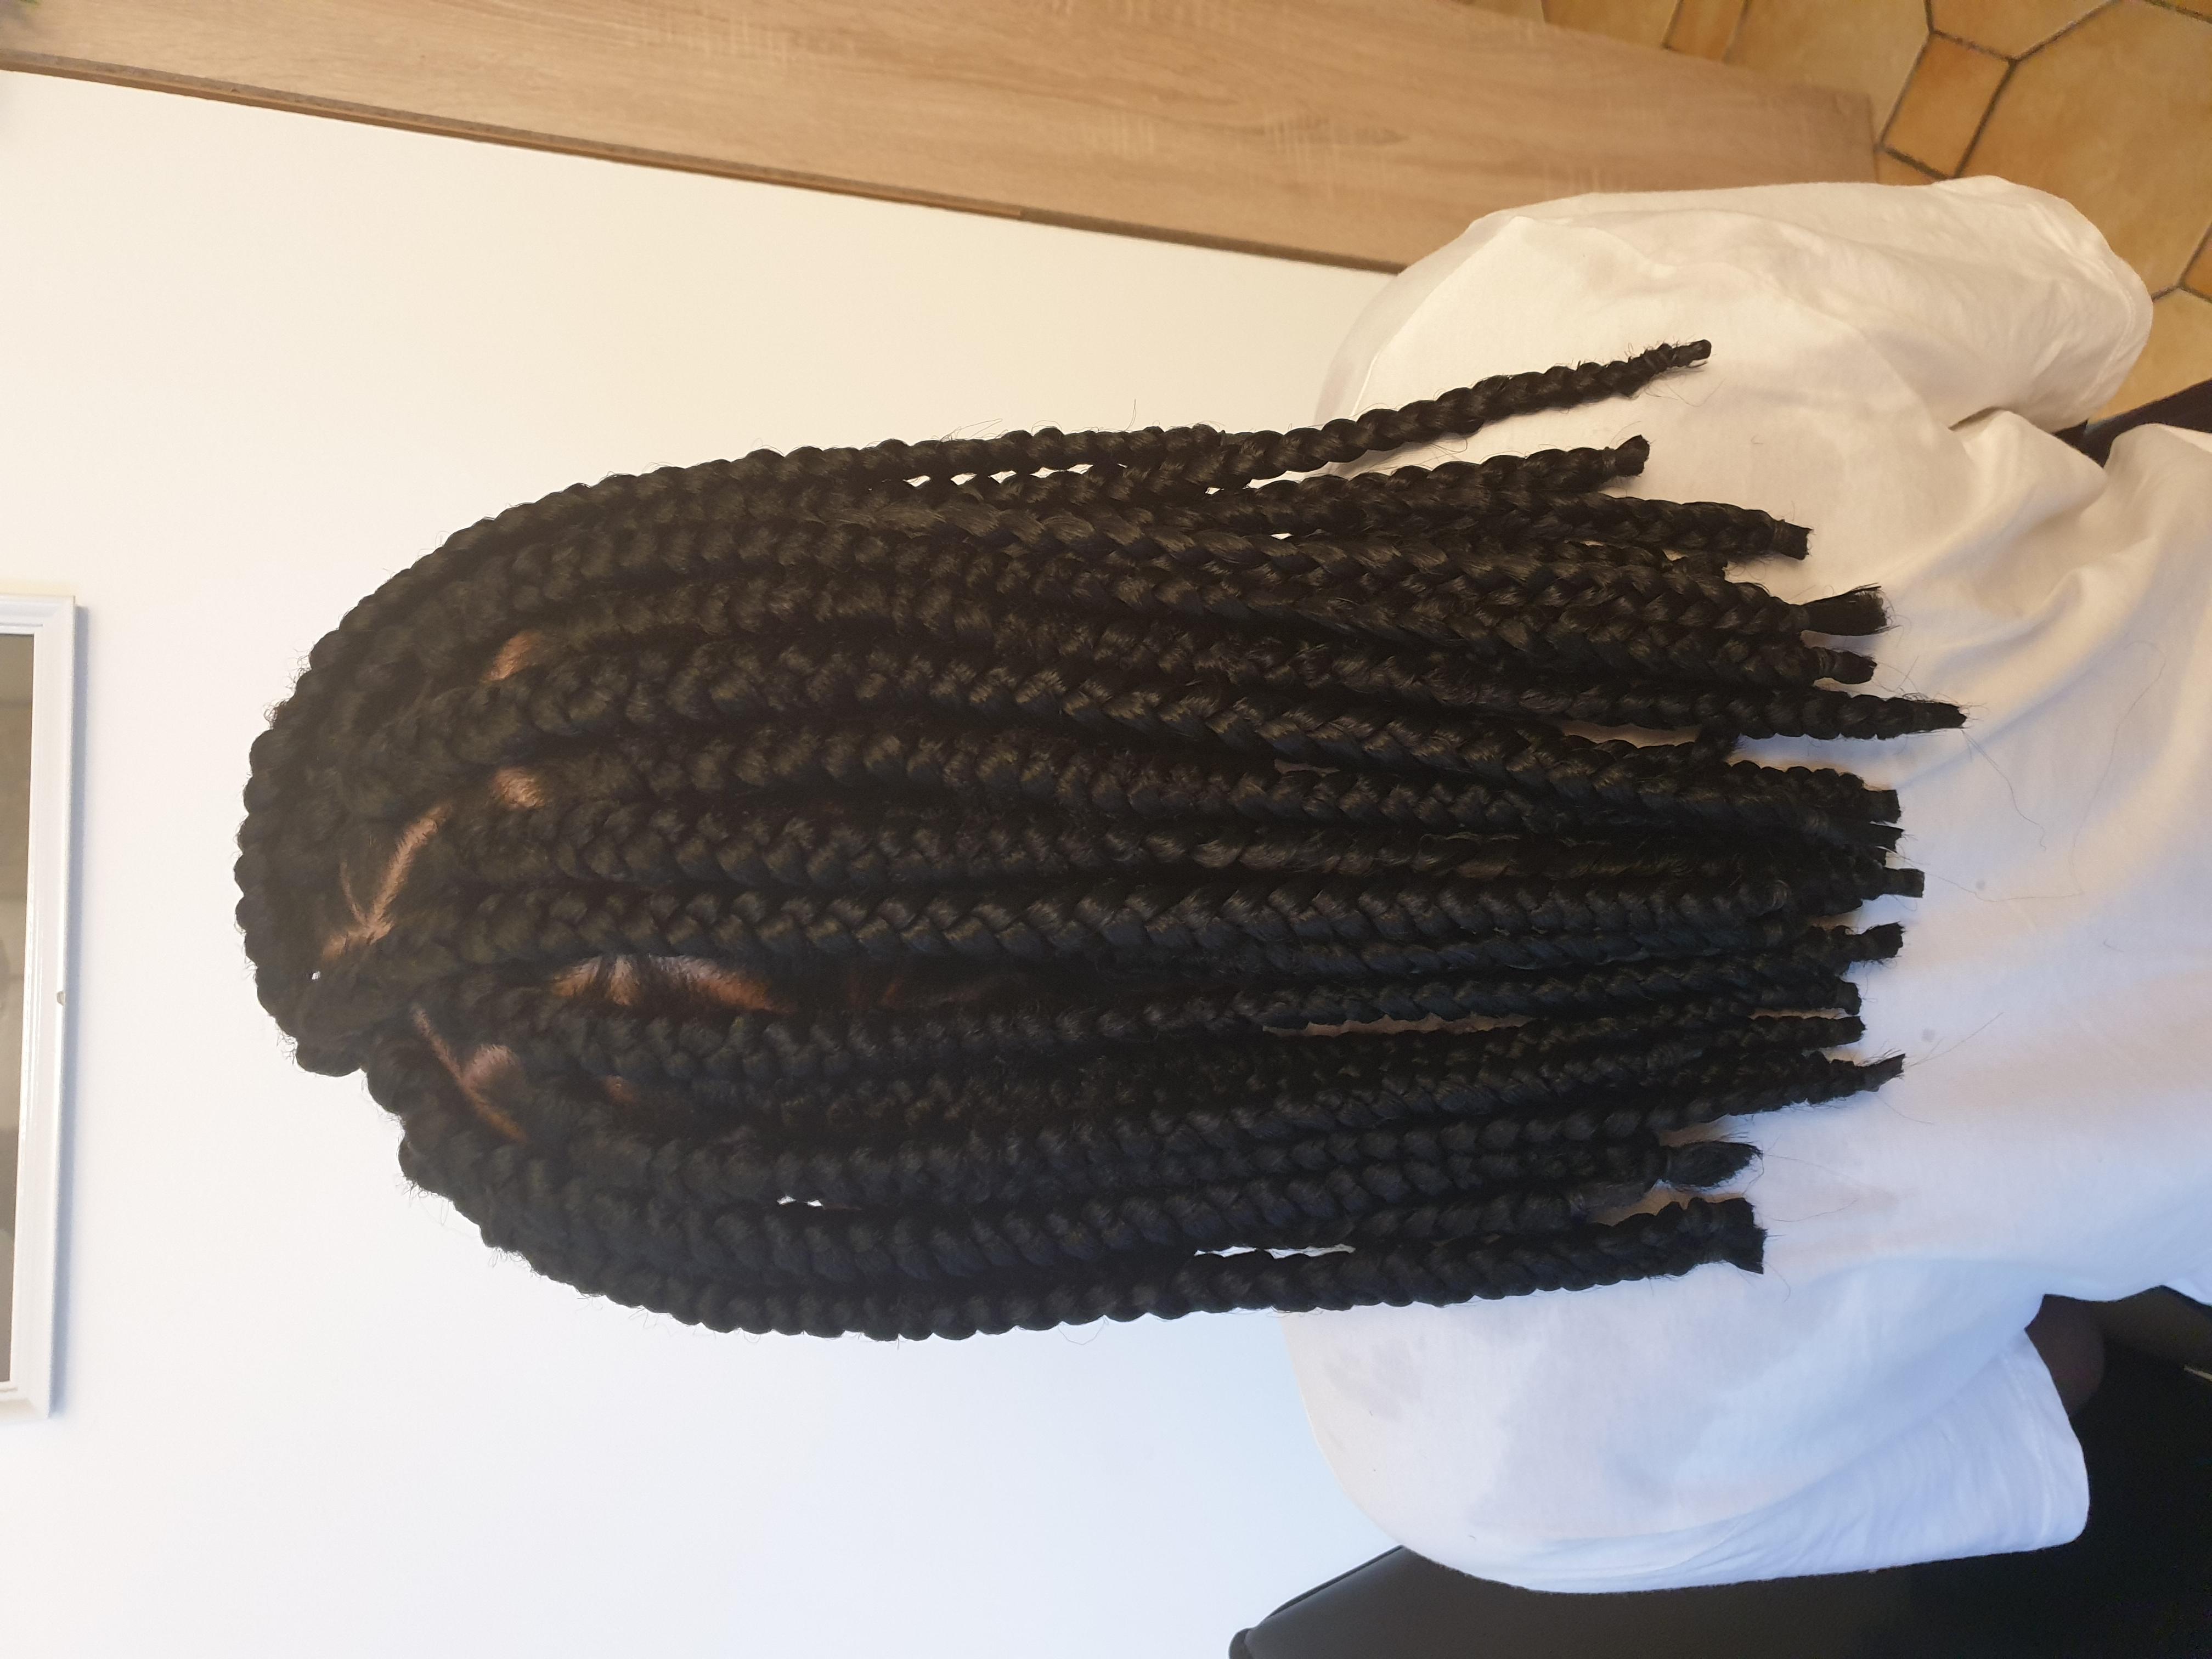 salon de coiffure afro tresse tresses box braids crochet braids vanilles tissages paris 75 77 78 91 92 93 94 95 WWBAAMFZ